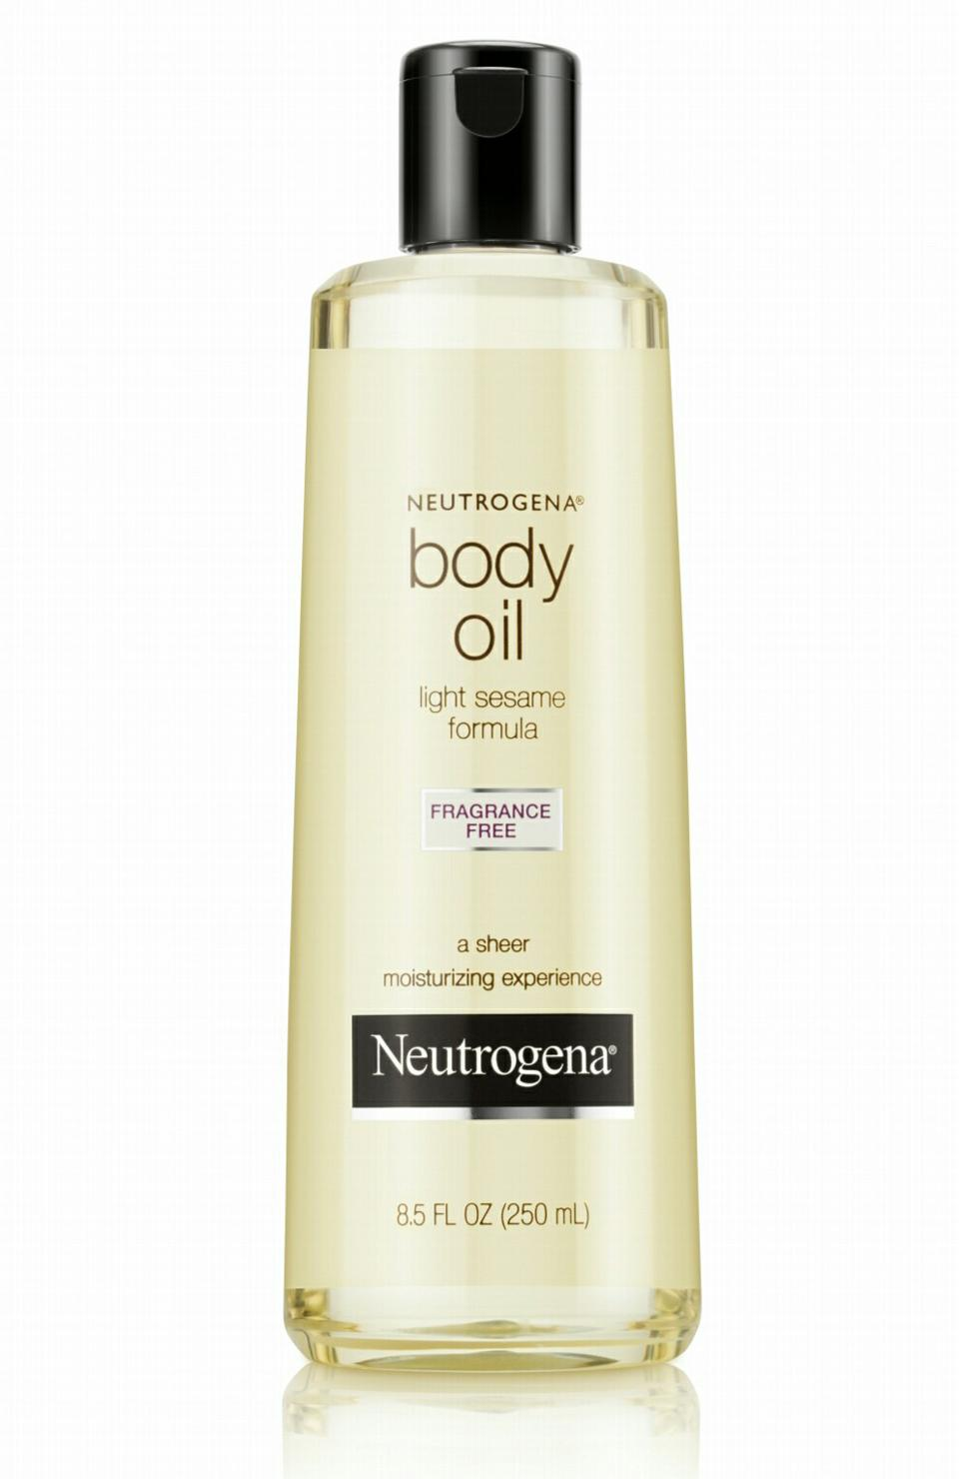 Neutrogena Body Oil